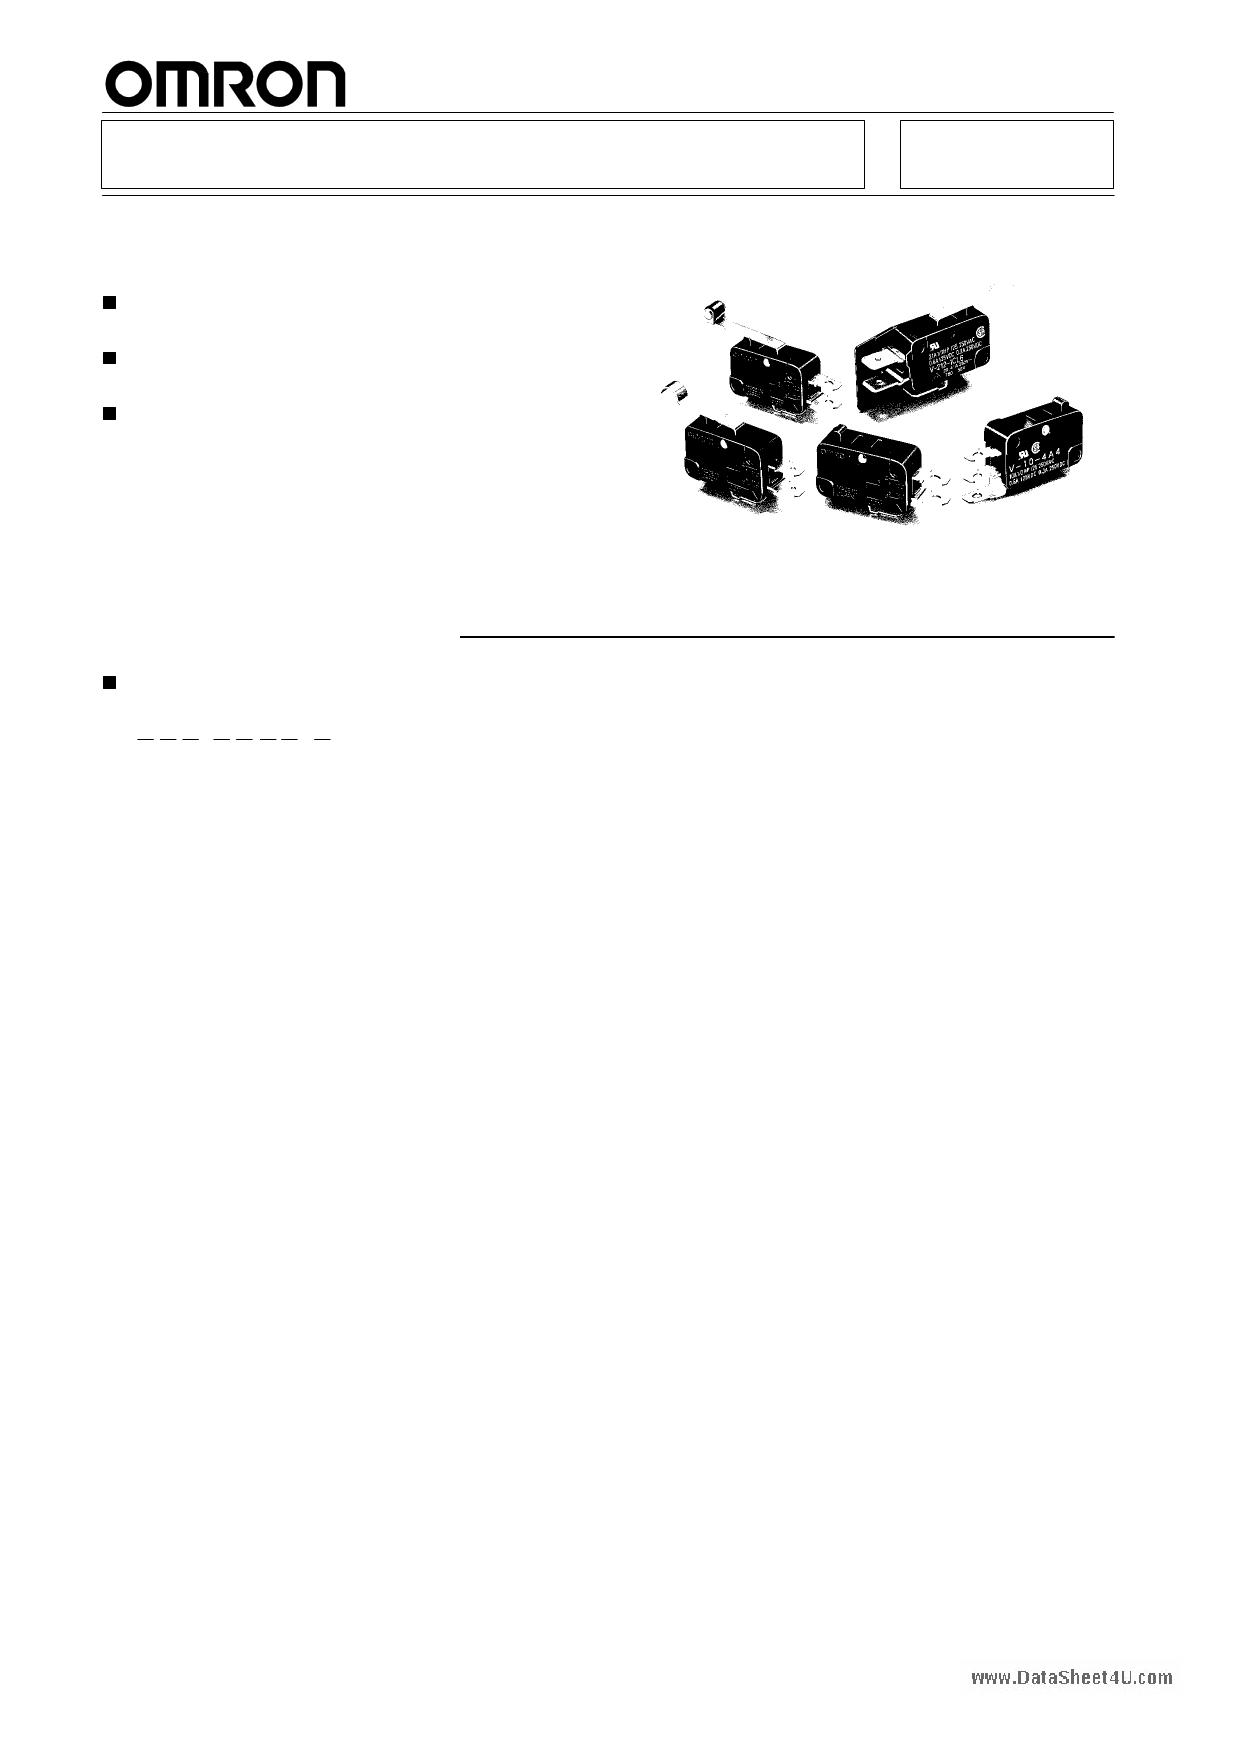 V-162-xxx Даташит, Описание, Даташиты